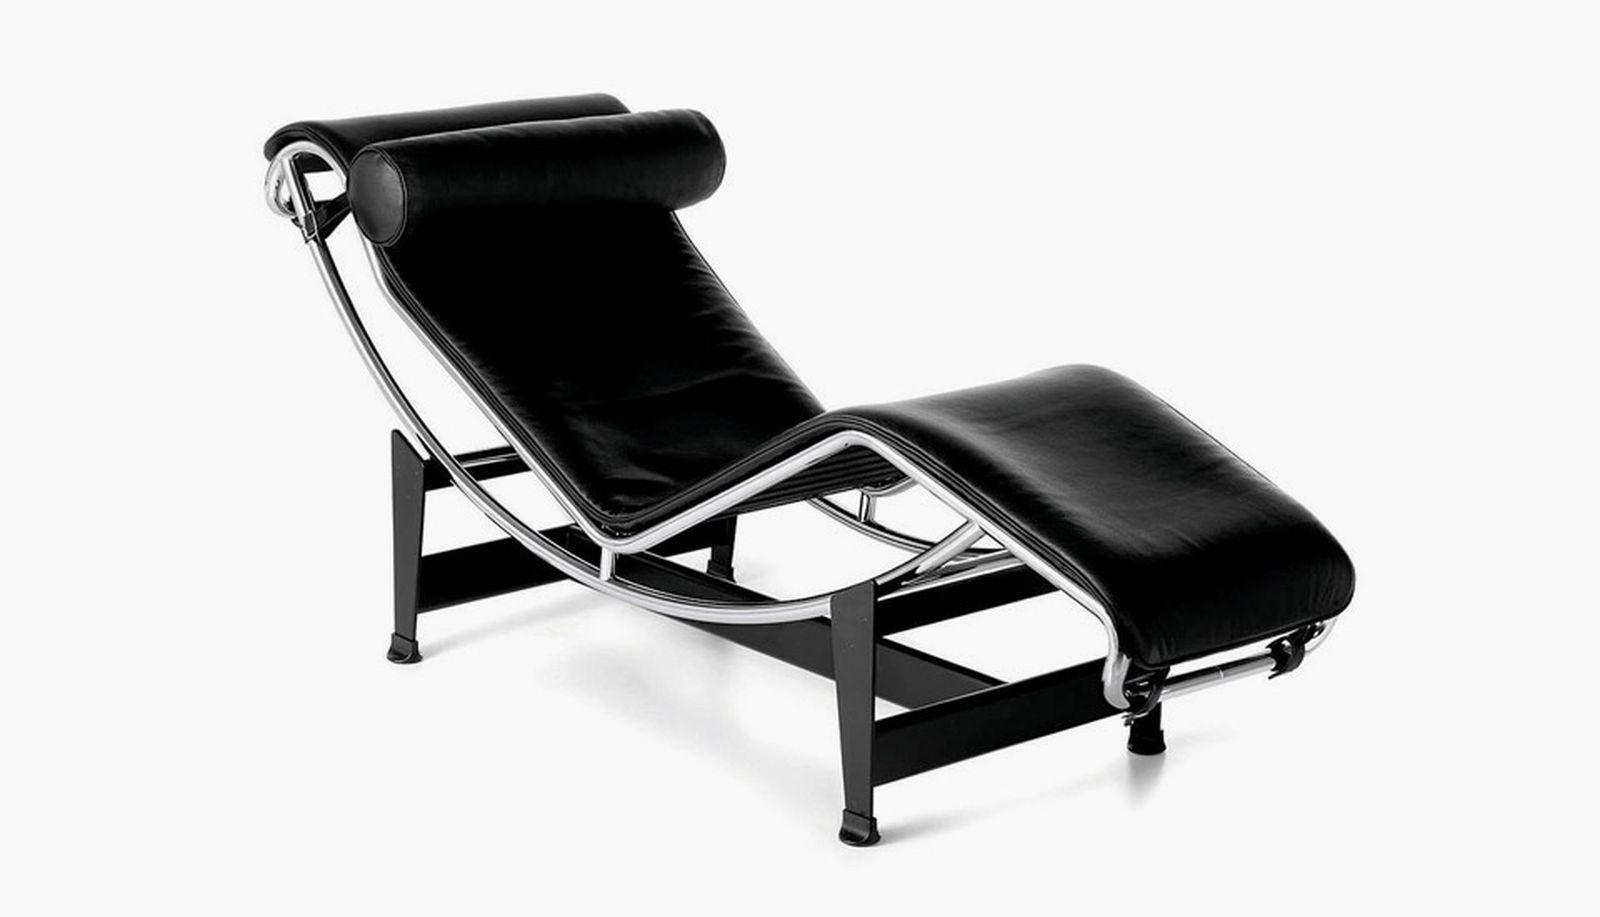 LC4-Chaise-Longue 2